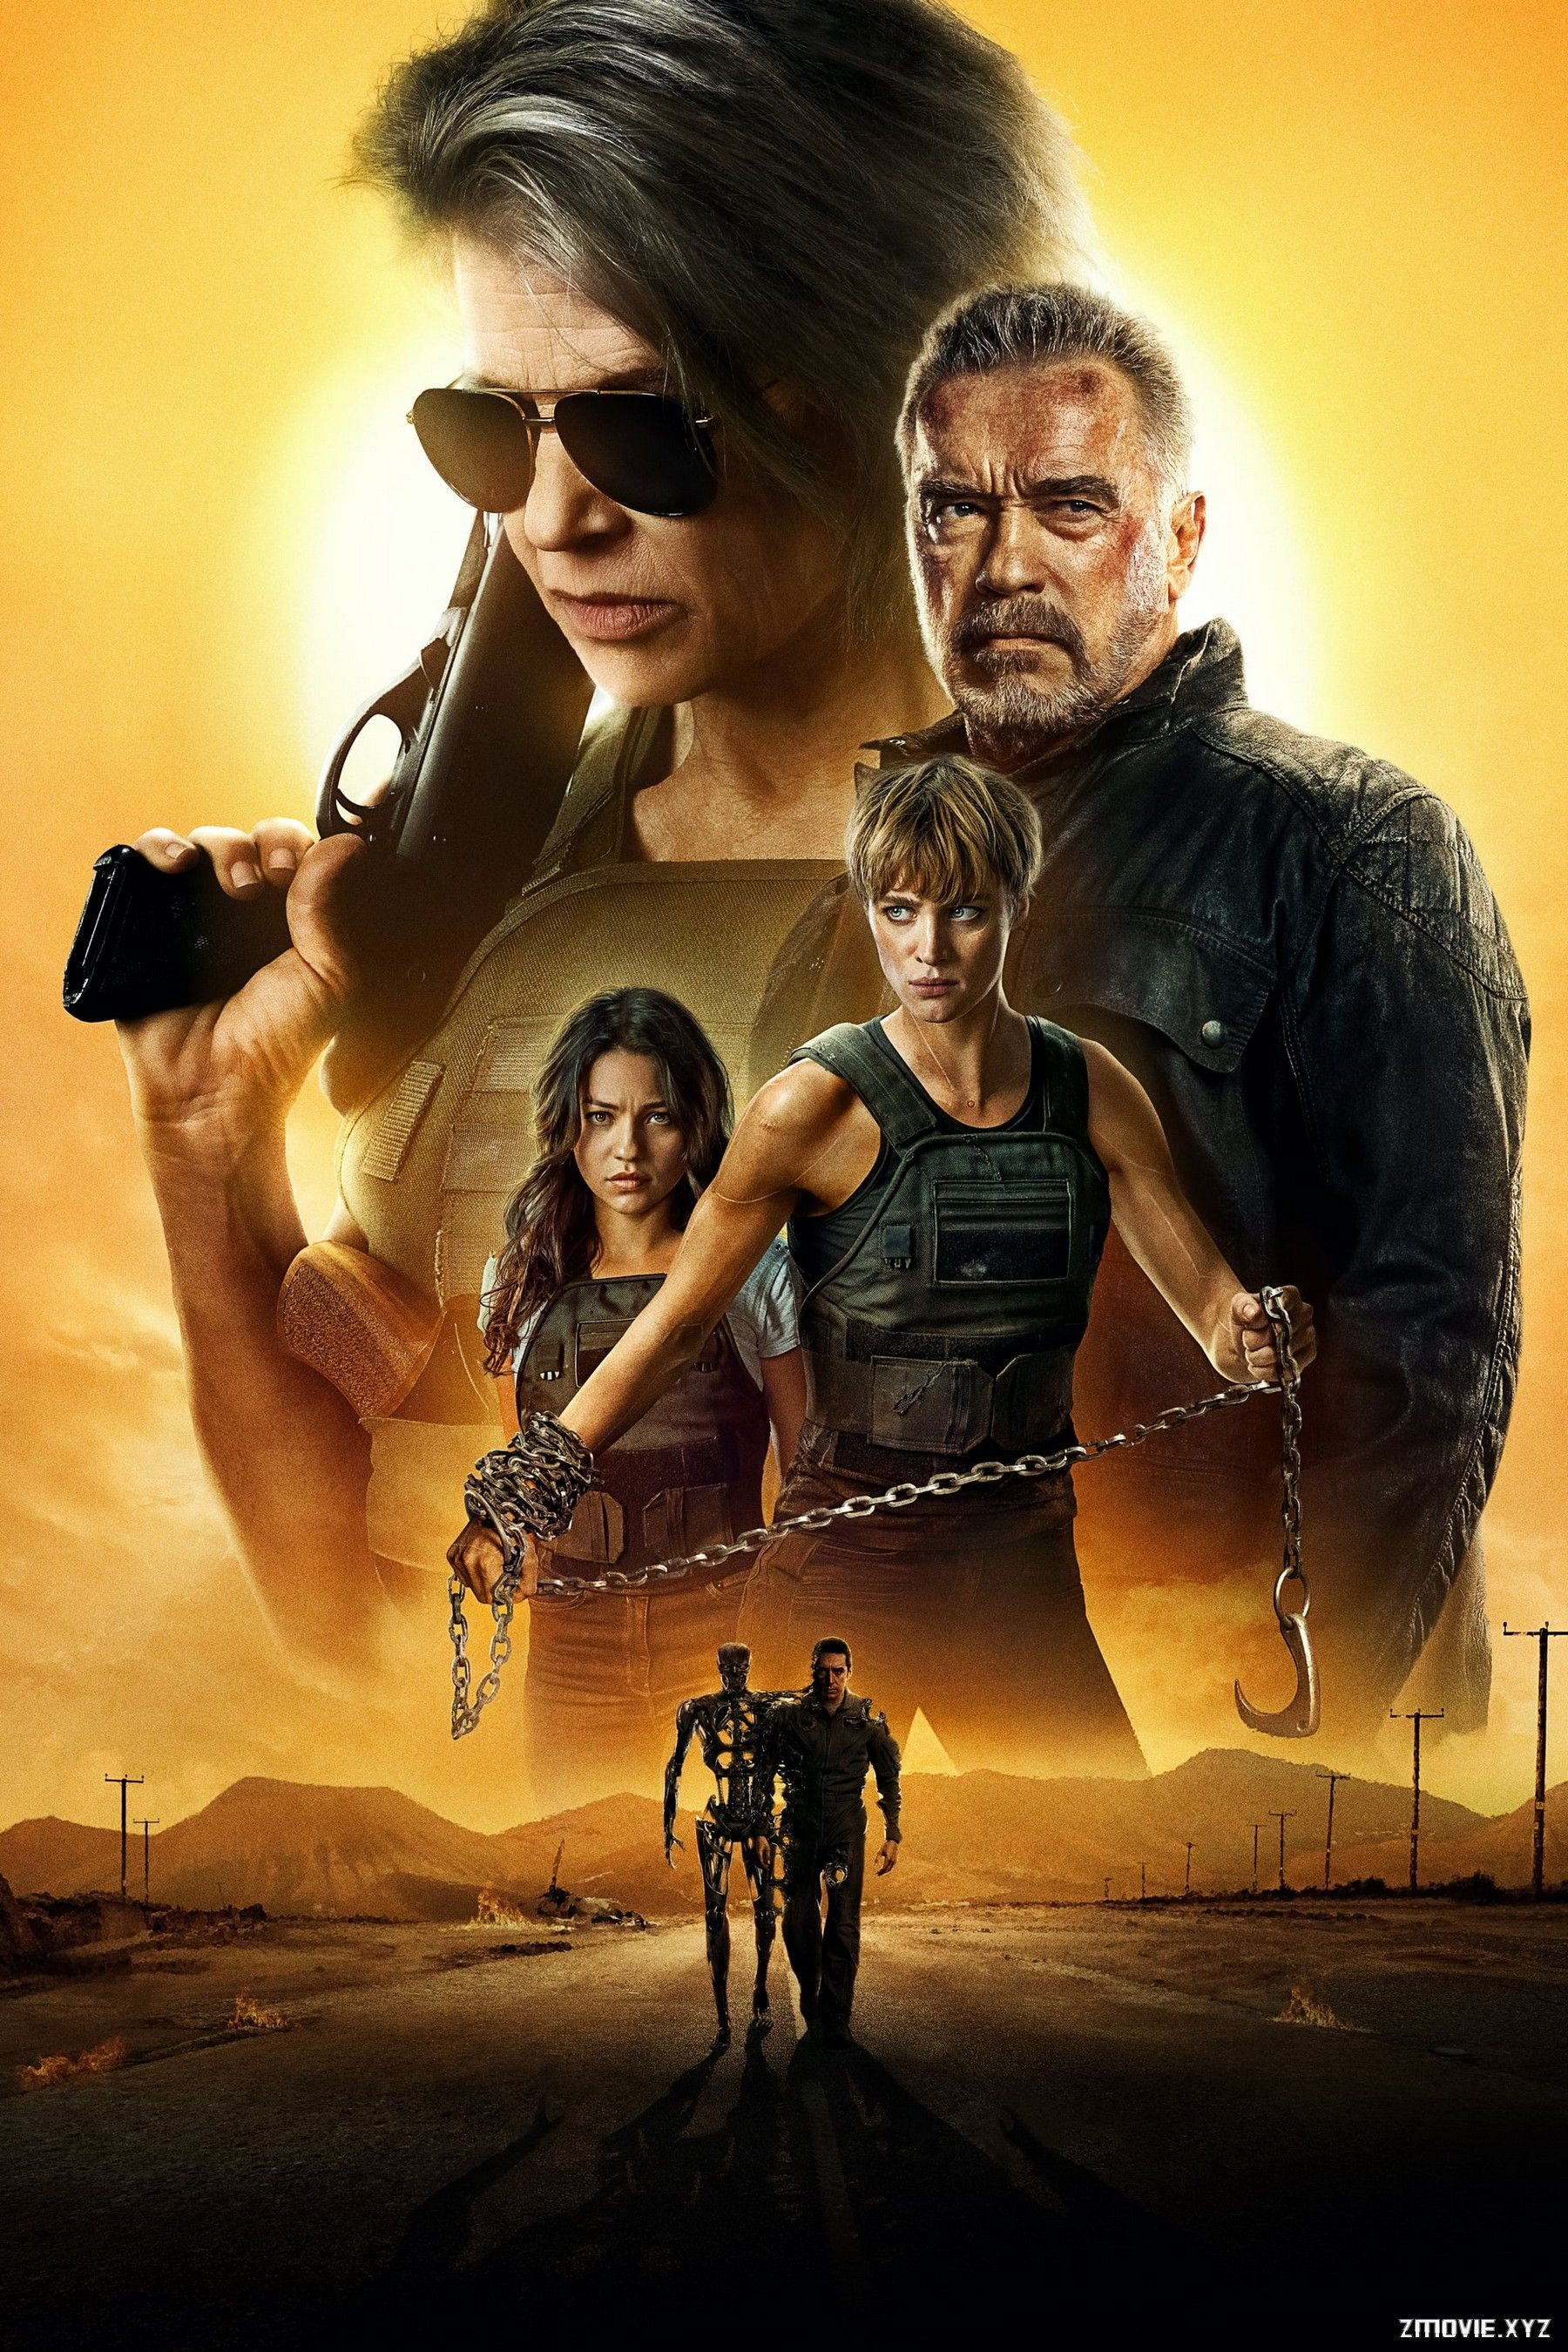 Terminator Destino Oscuro Pelicula Completa 2019 Espanol Latino English Movies Terminator Movies Hollywood Action Movies